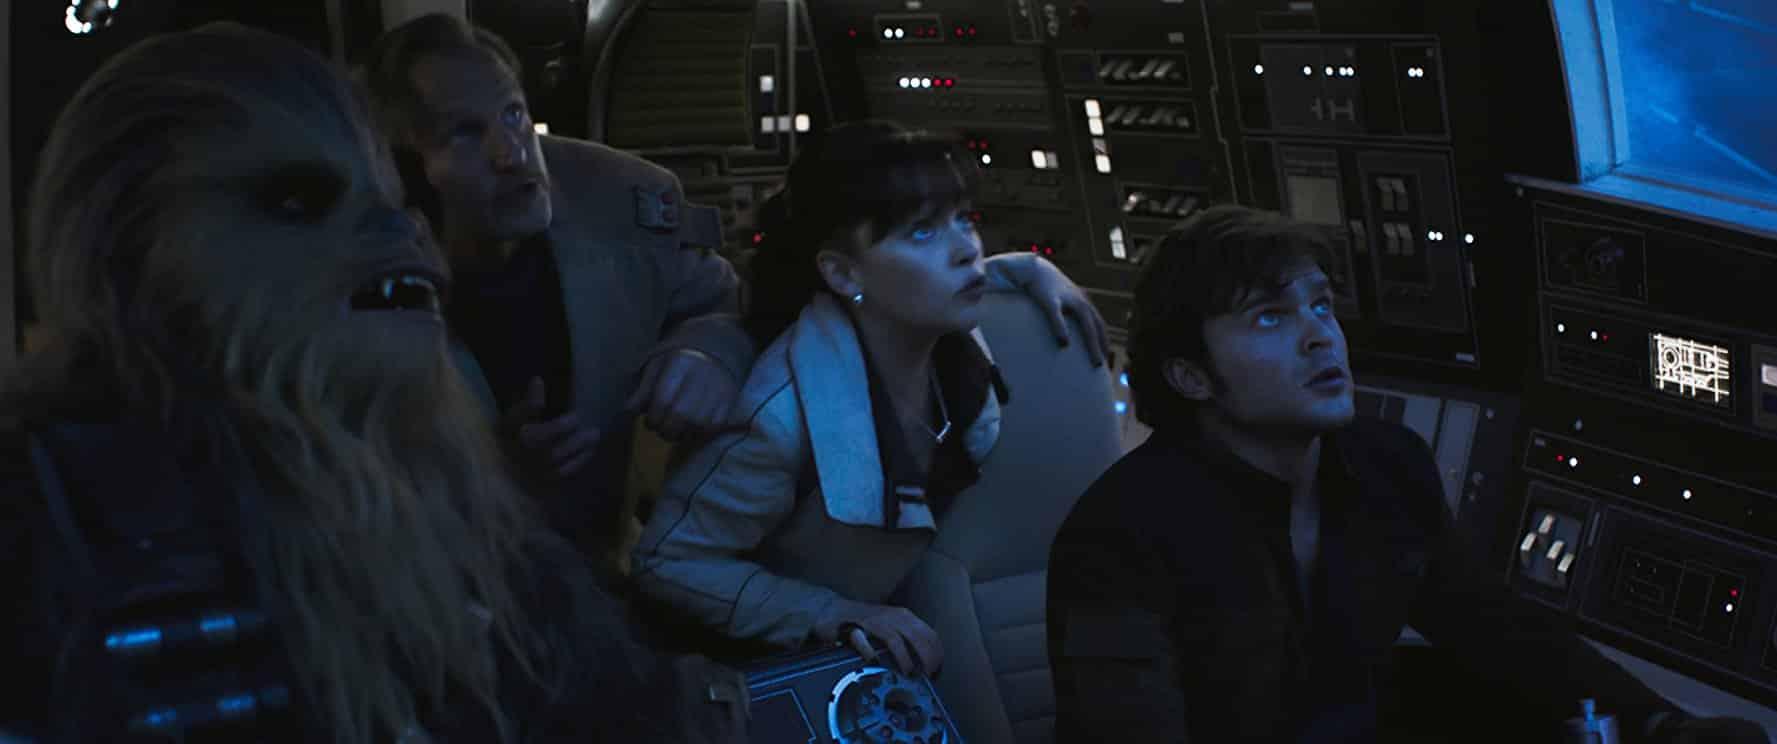 Solo: A Star Wars Story tendrá su premiere en Cannes 2018